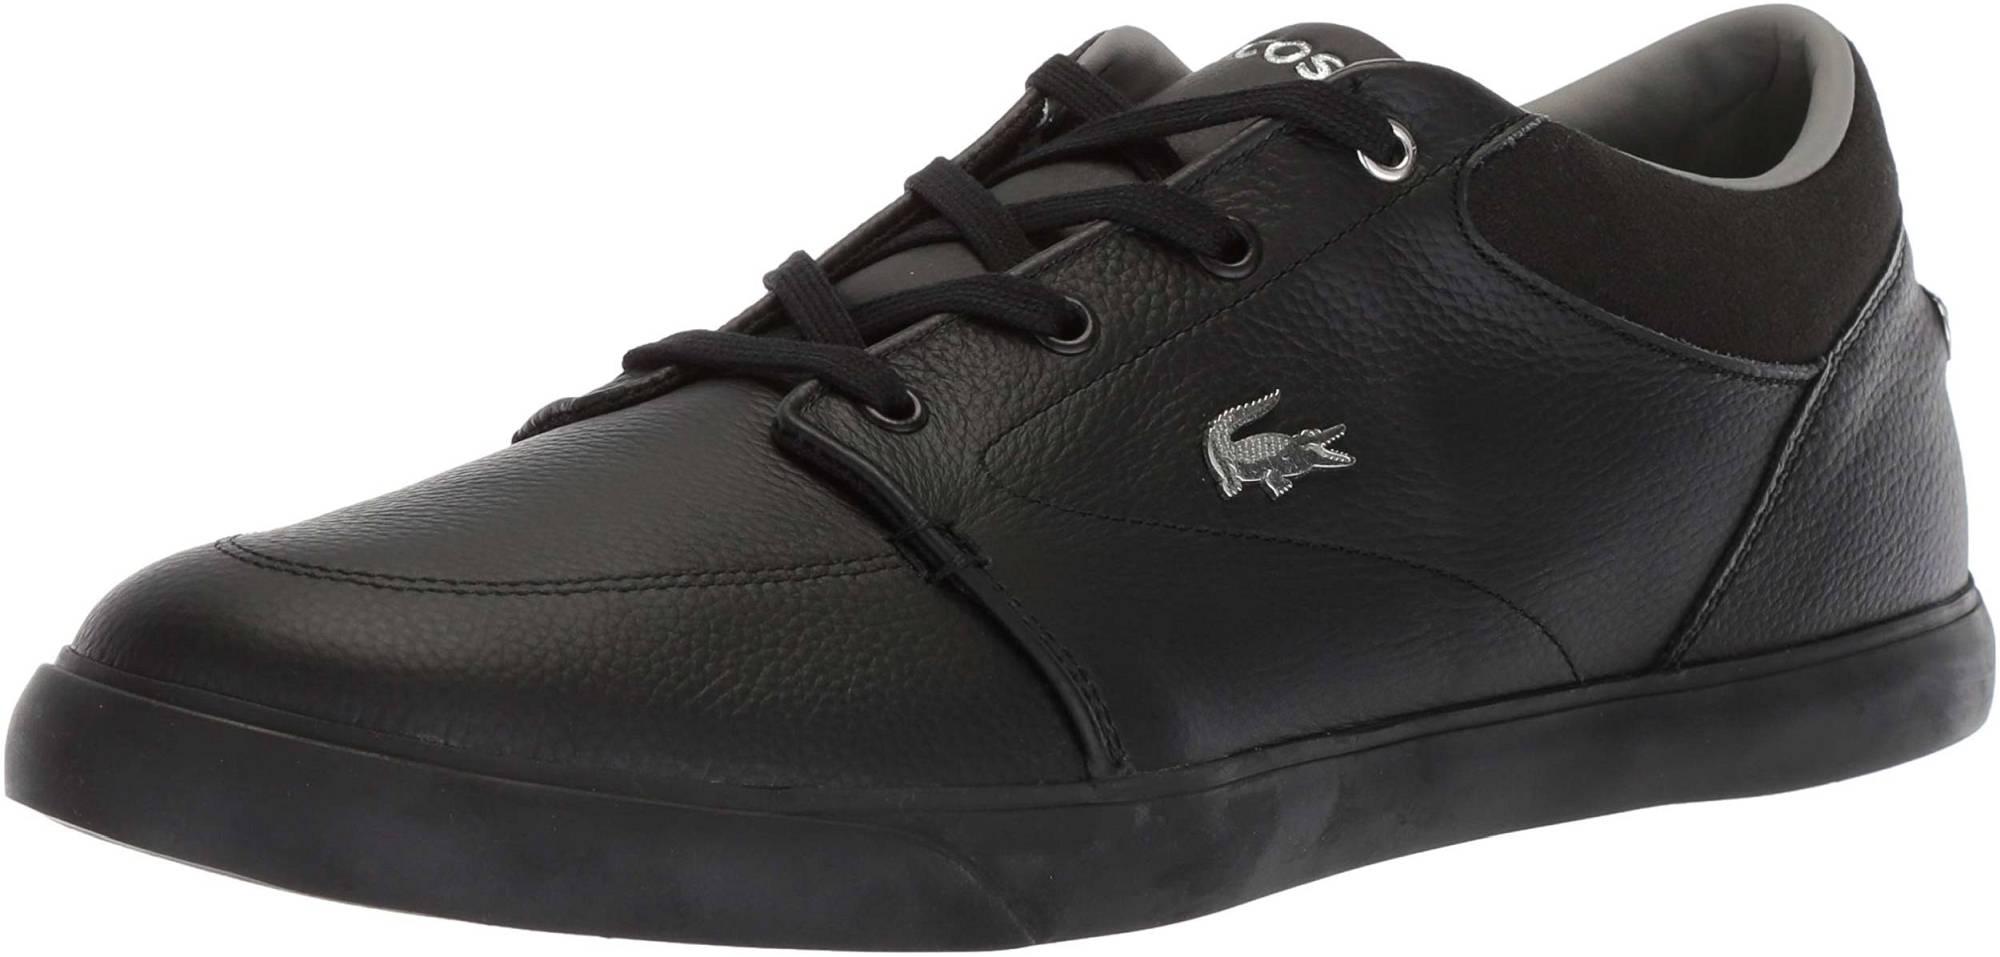 Bayliss Sneaker color